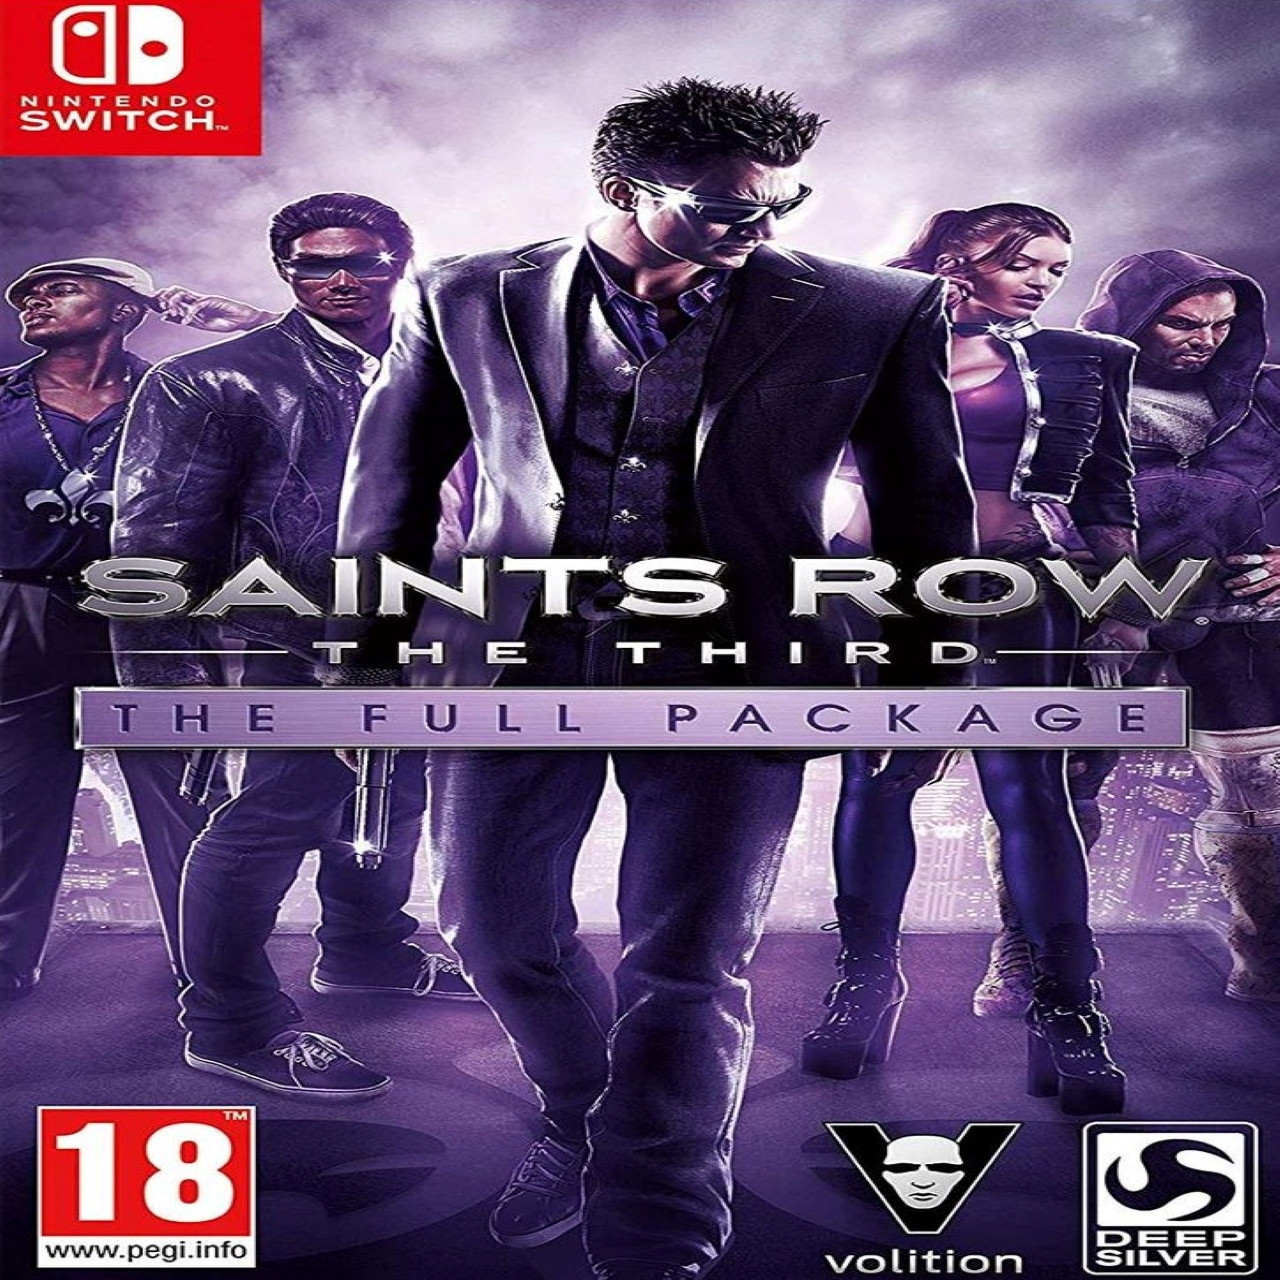 Saints Row: The Third - The Full Package (російські субтитри) Nintendo Switch